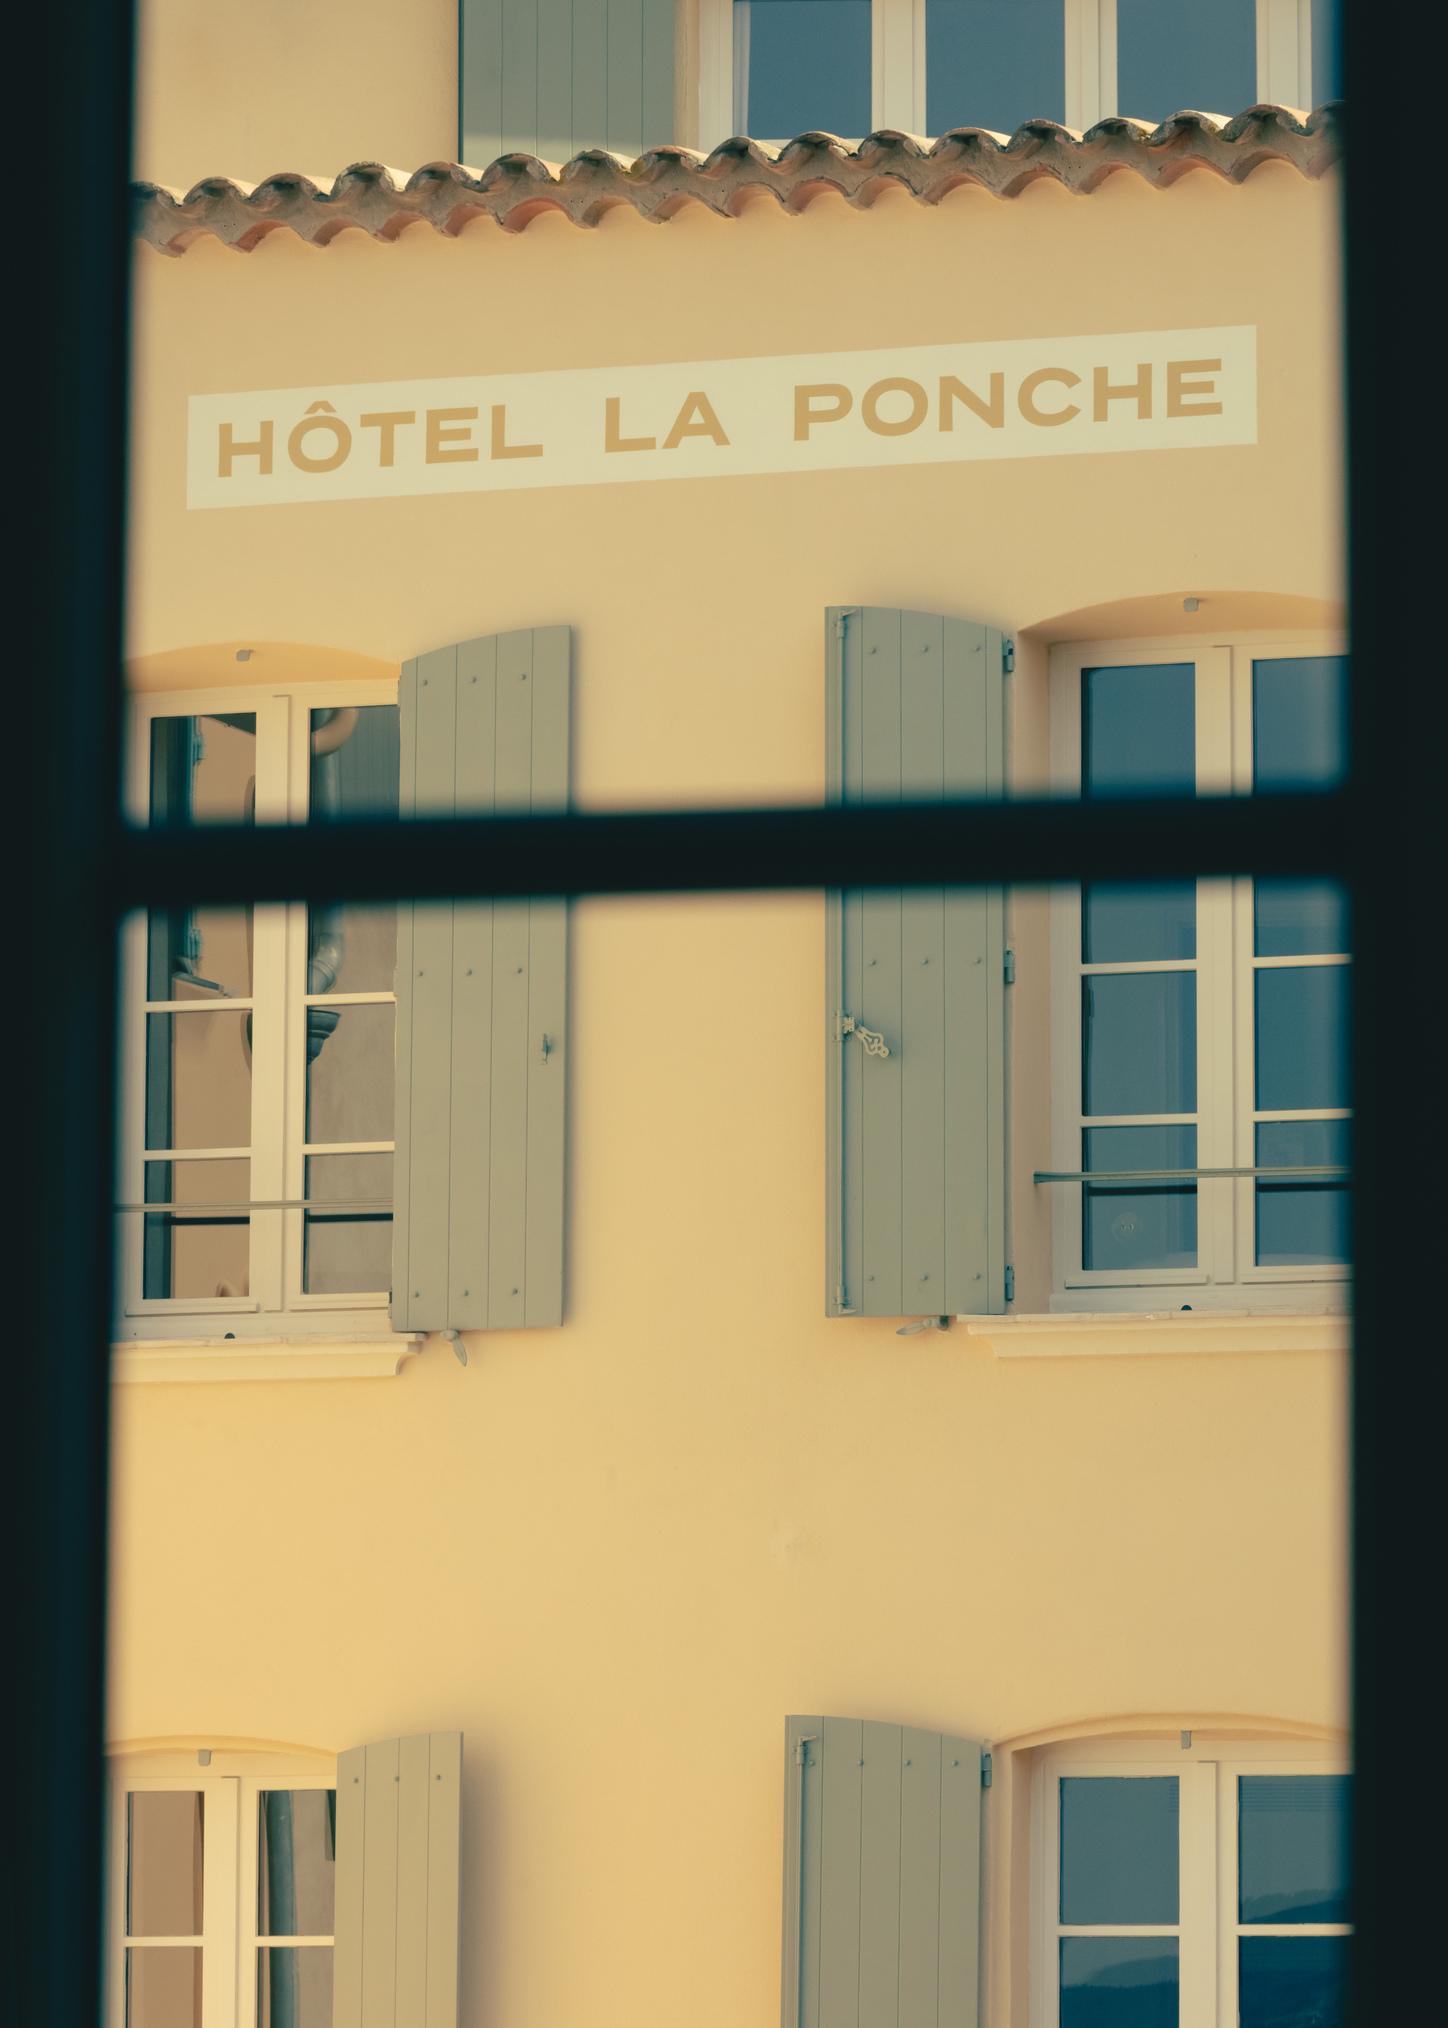 HD_LaPonche_28A6963 (1) (1)